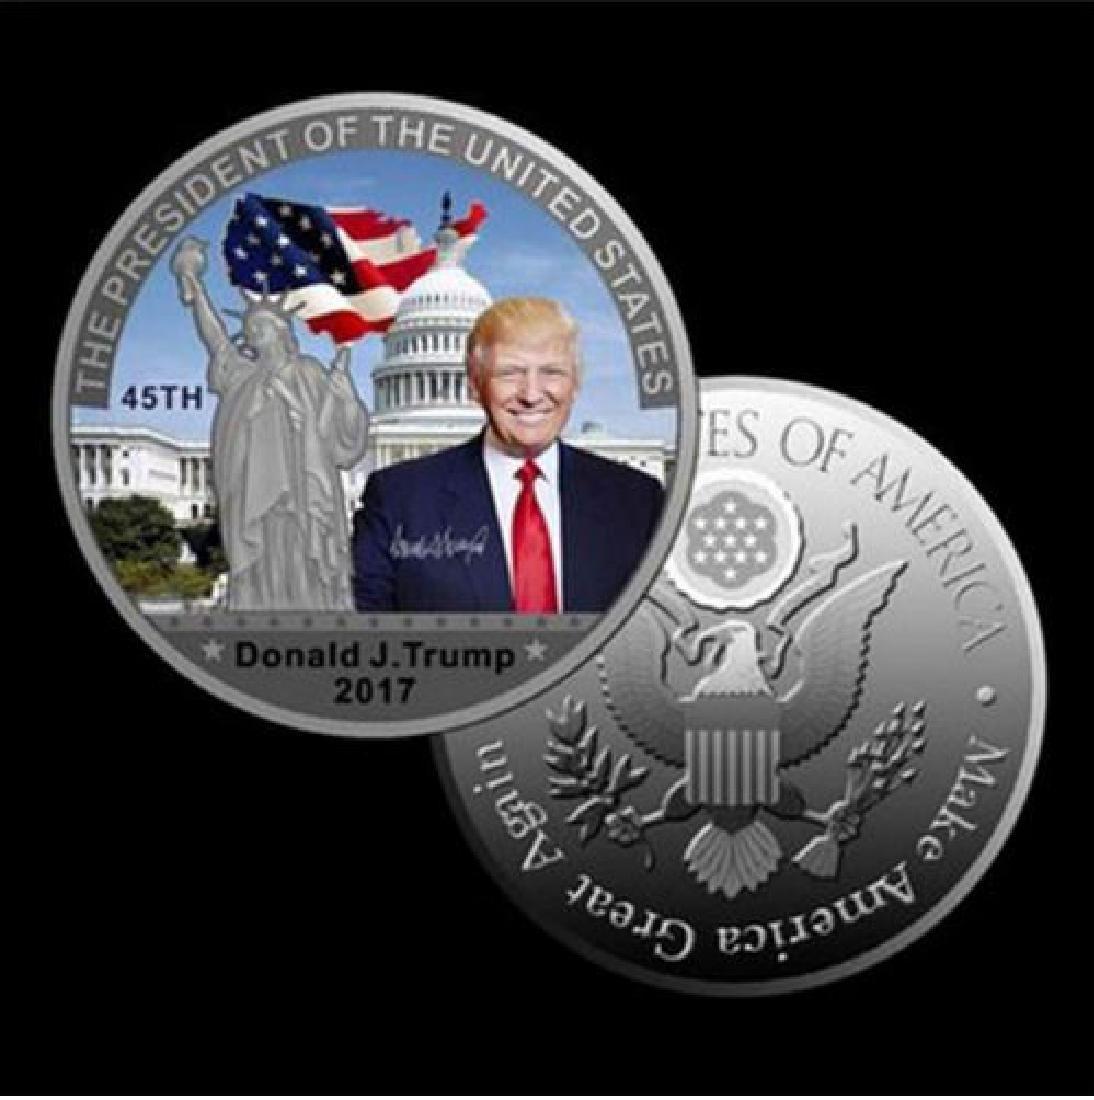 Donald Trump 45th President Statue of Liberty - 4